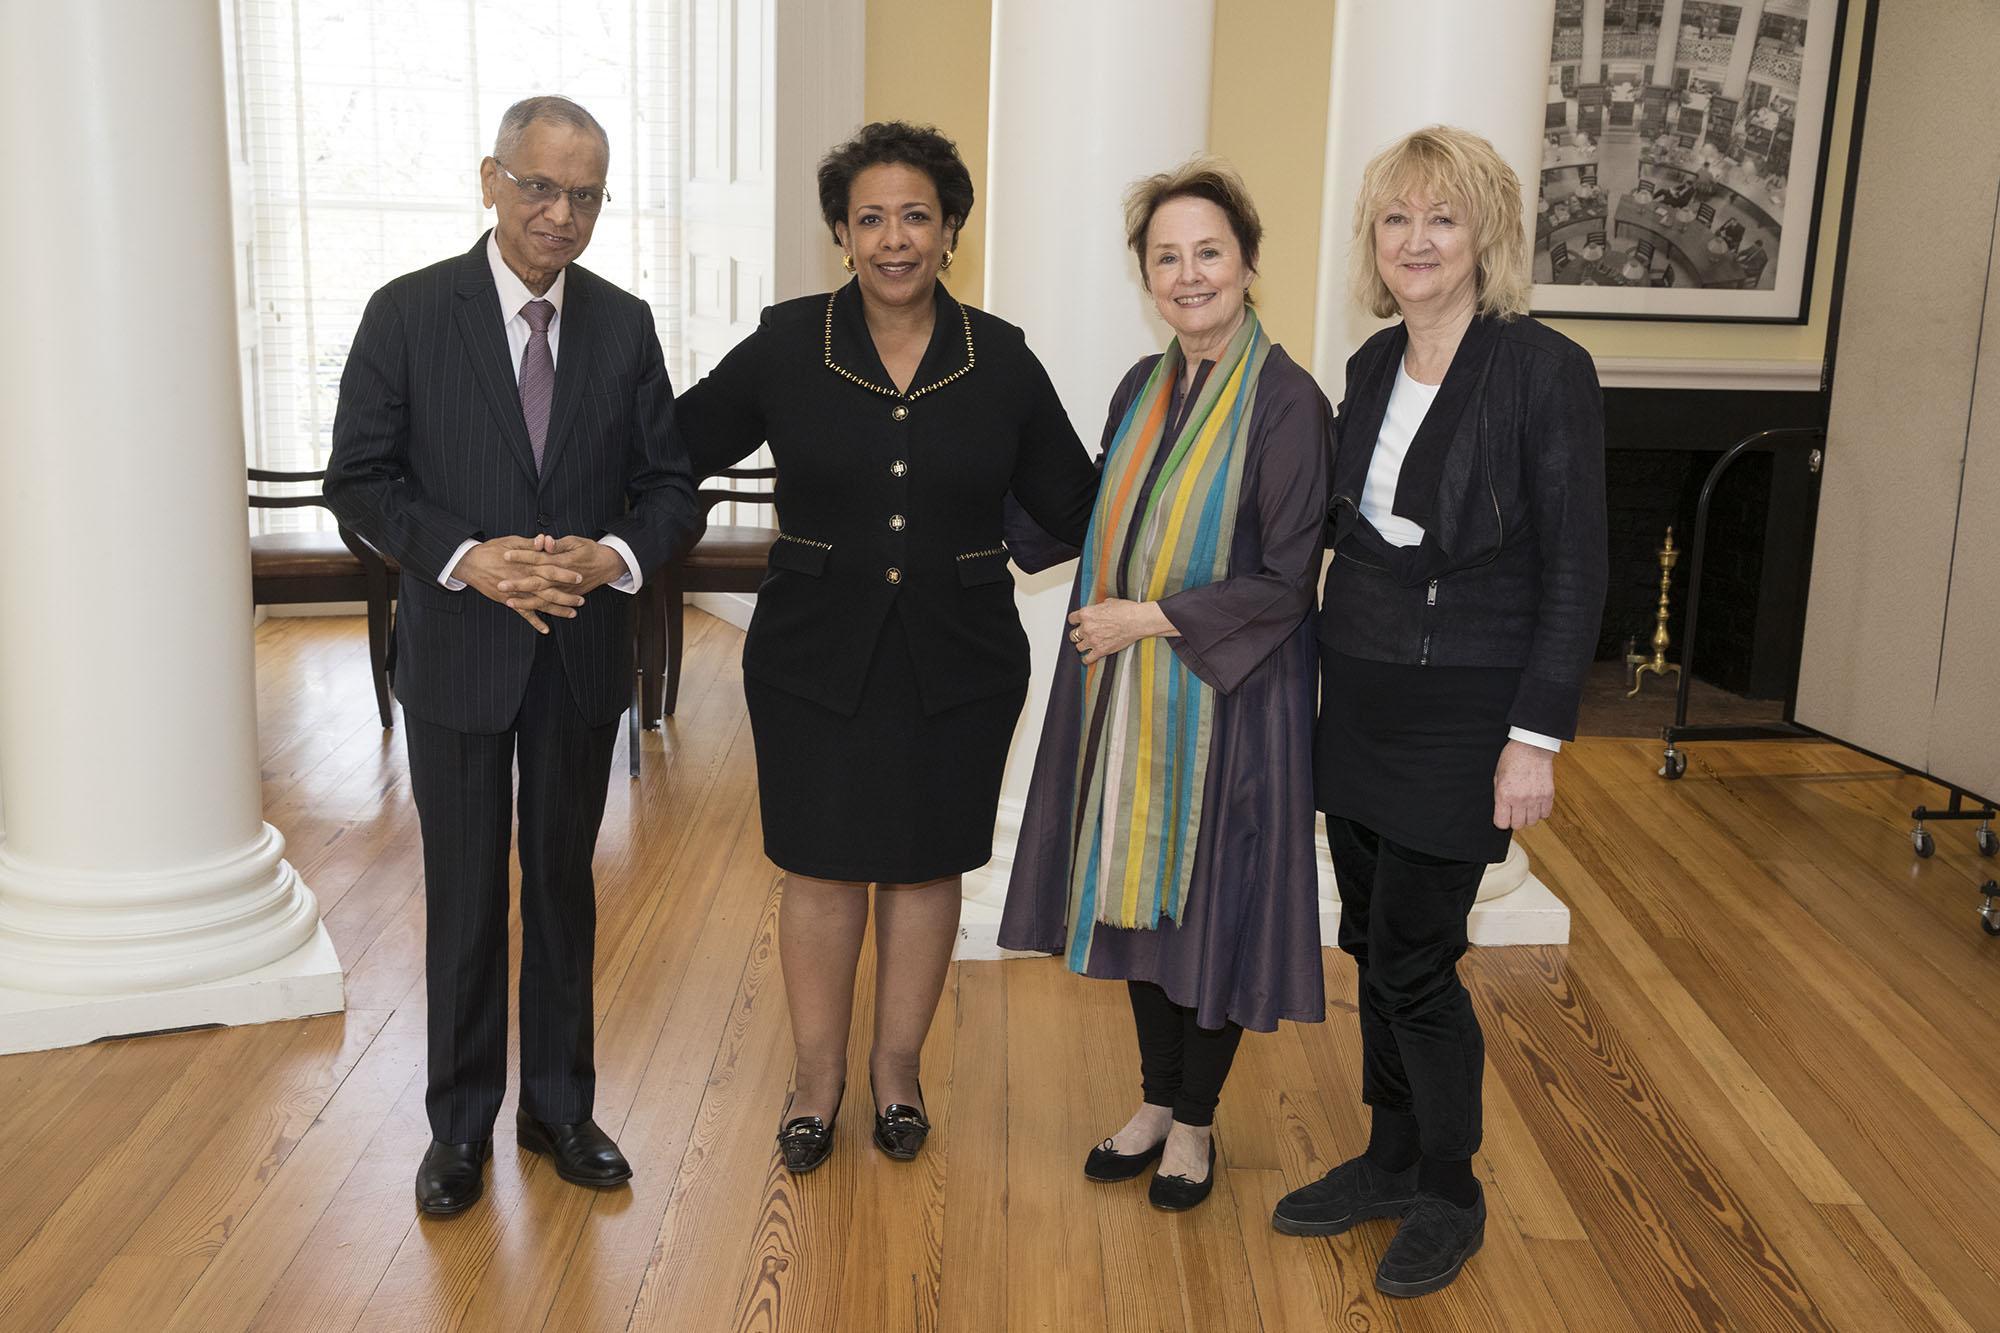 Left to right, Thomas Jefferson Foundation Medalists N.R. Narayana Murthy, Loretta Lynch, Alice Waters and Yvonne Farrell. Not pictured: Shelley McNamara. (Photo by Dan Addison, University Communications)